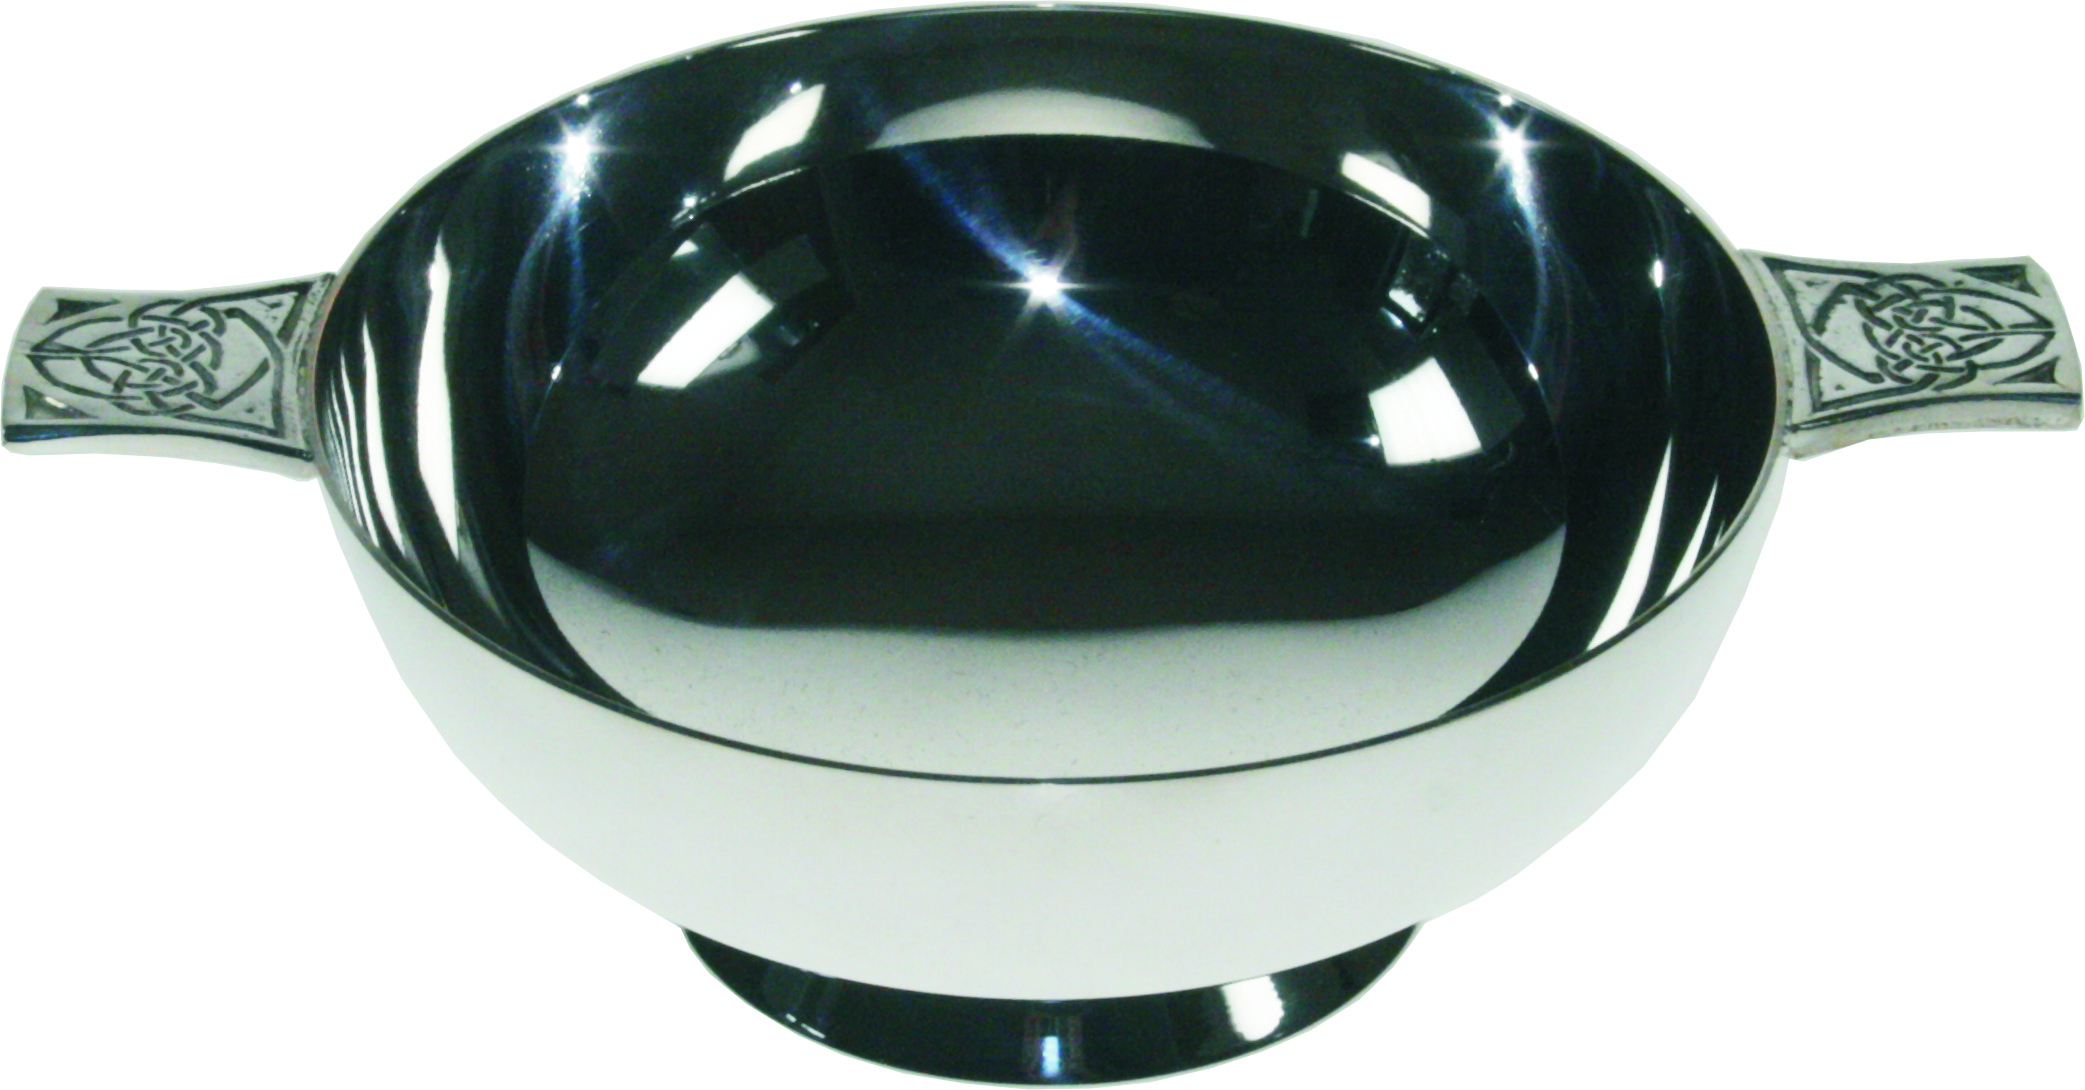 "Spun Silver Plated Quaich Bowl Celtic Detailed Handles 10.5cm (4"")"